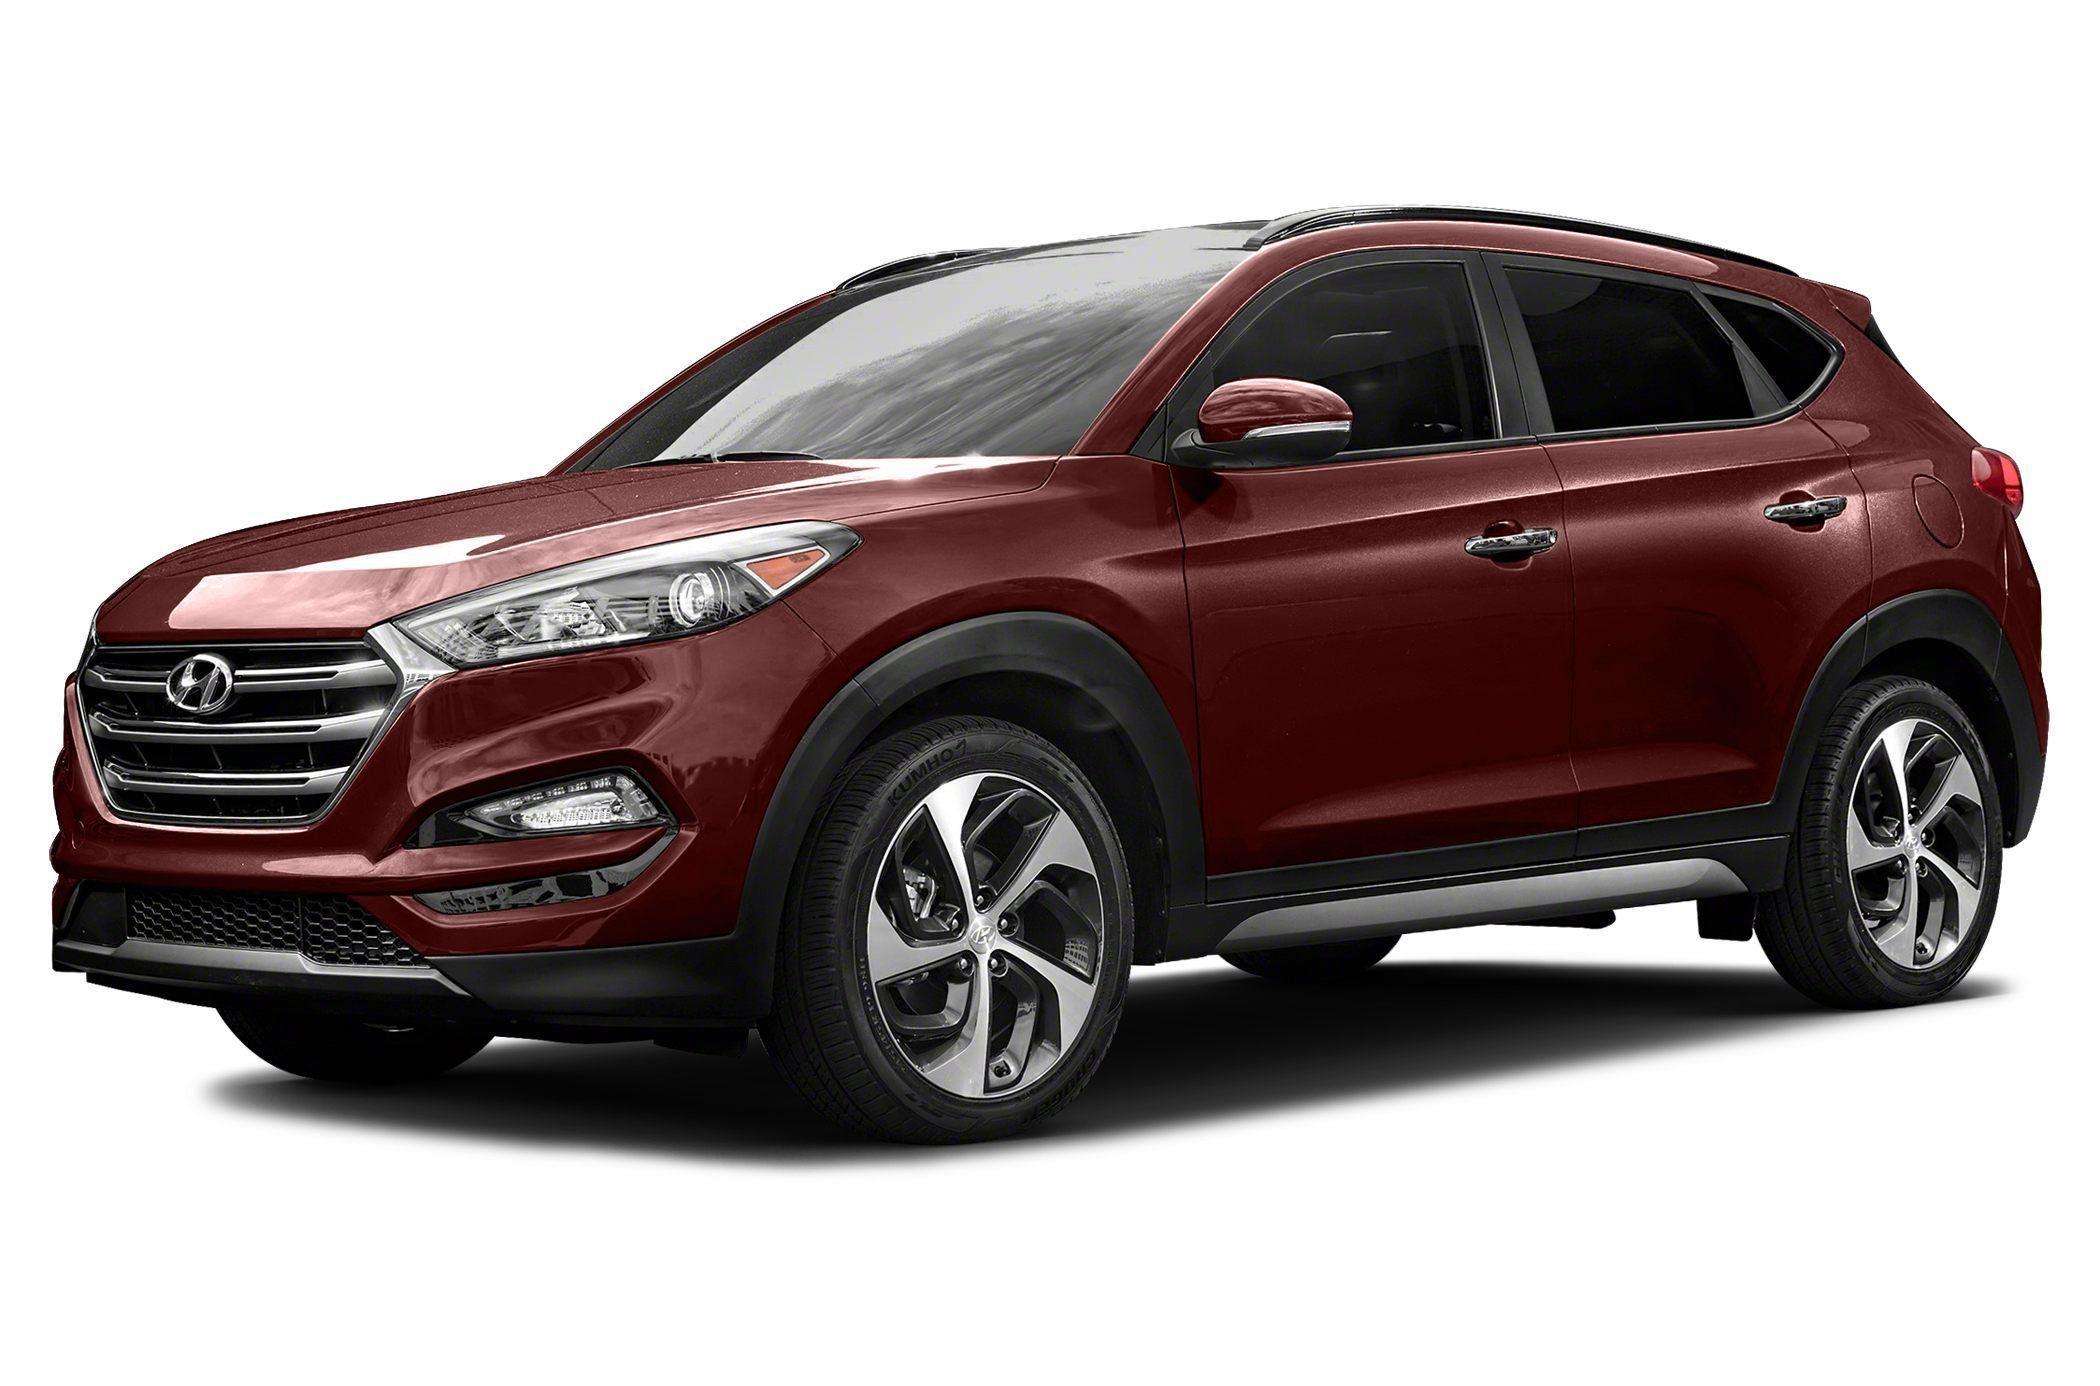 Ejp Massgefertigter Autositzbezug Fur Hyundai Tucson Ii Beste